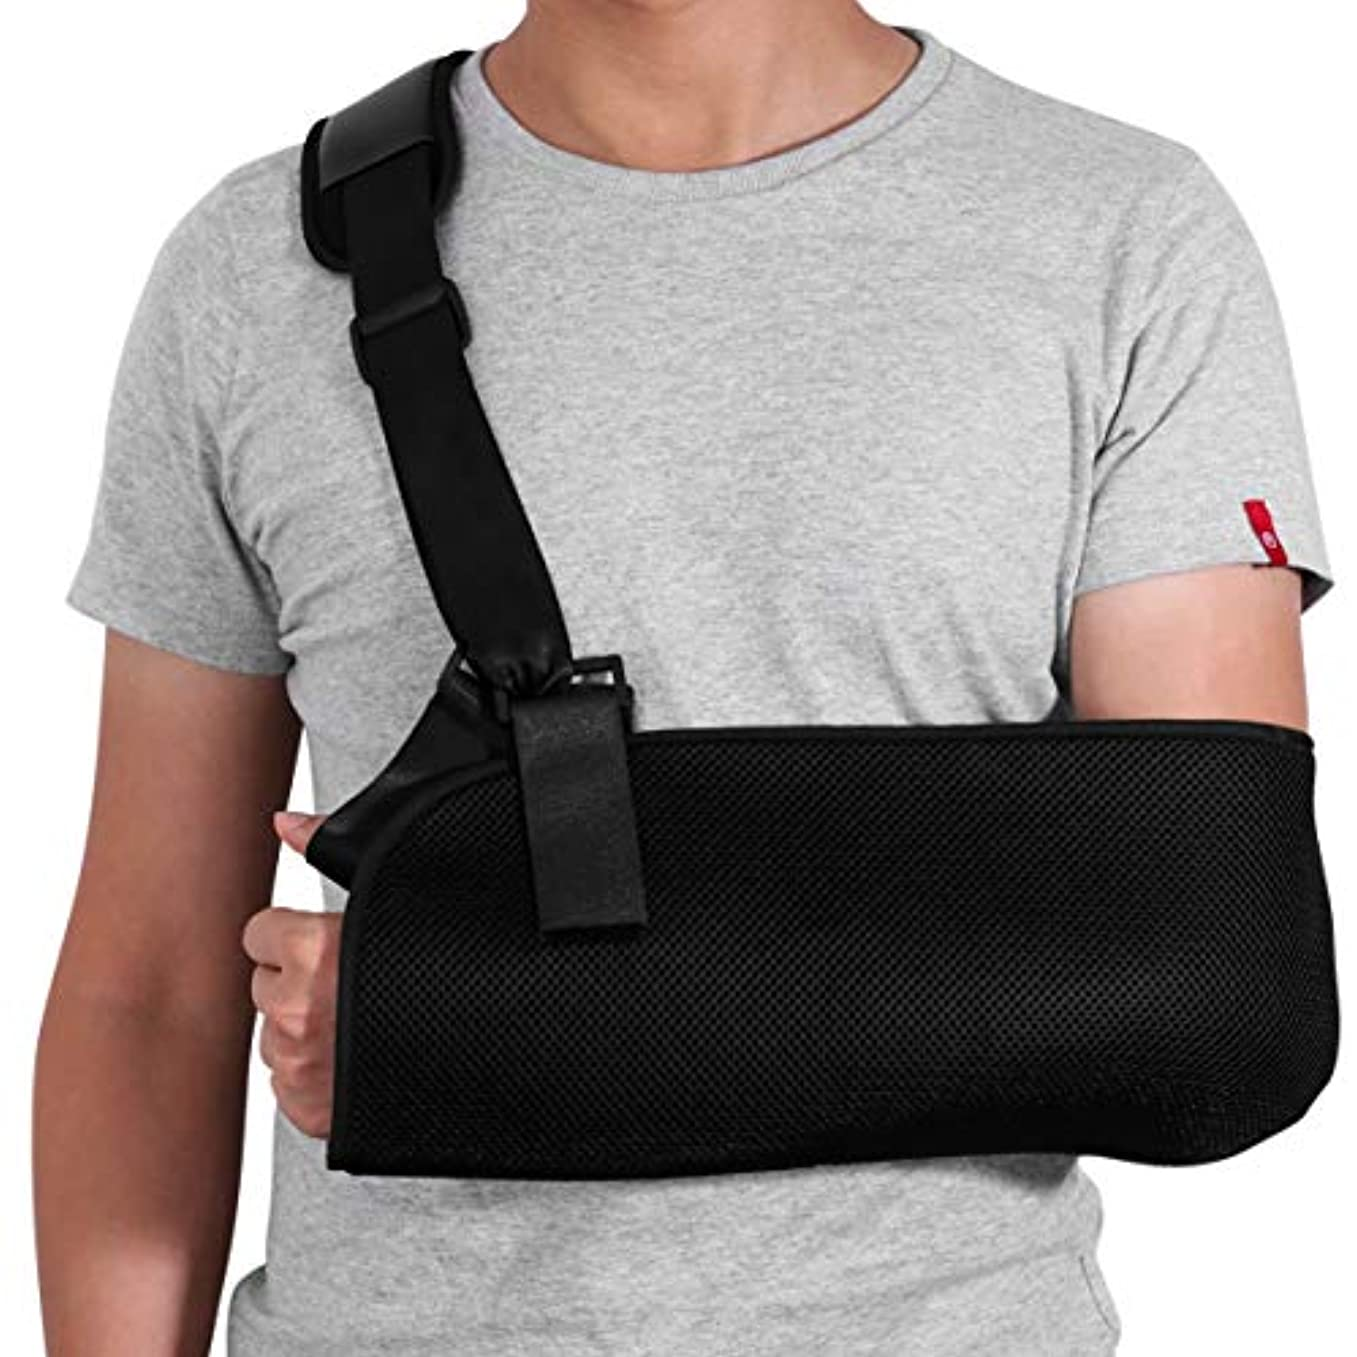 Healifty アームスリングメディカルサポートストラップショルダーブレース肘サポート骨折した骨折した腕2ピース